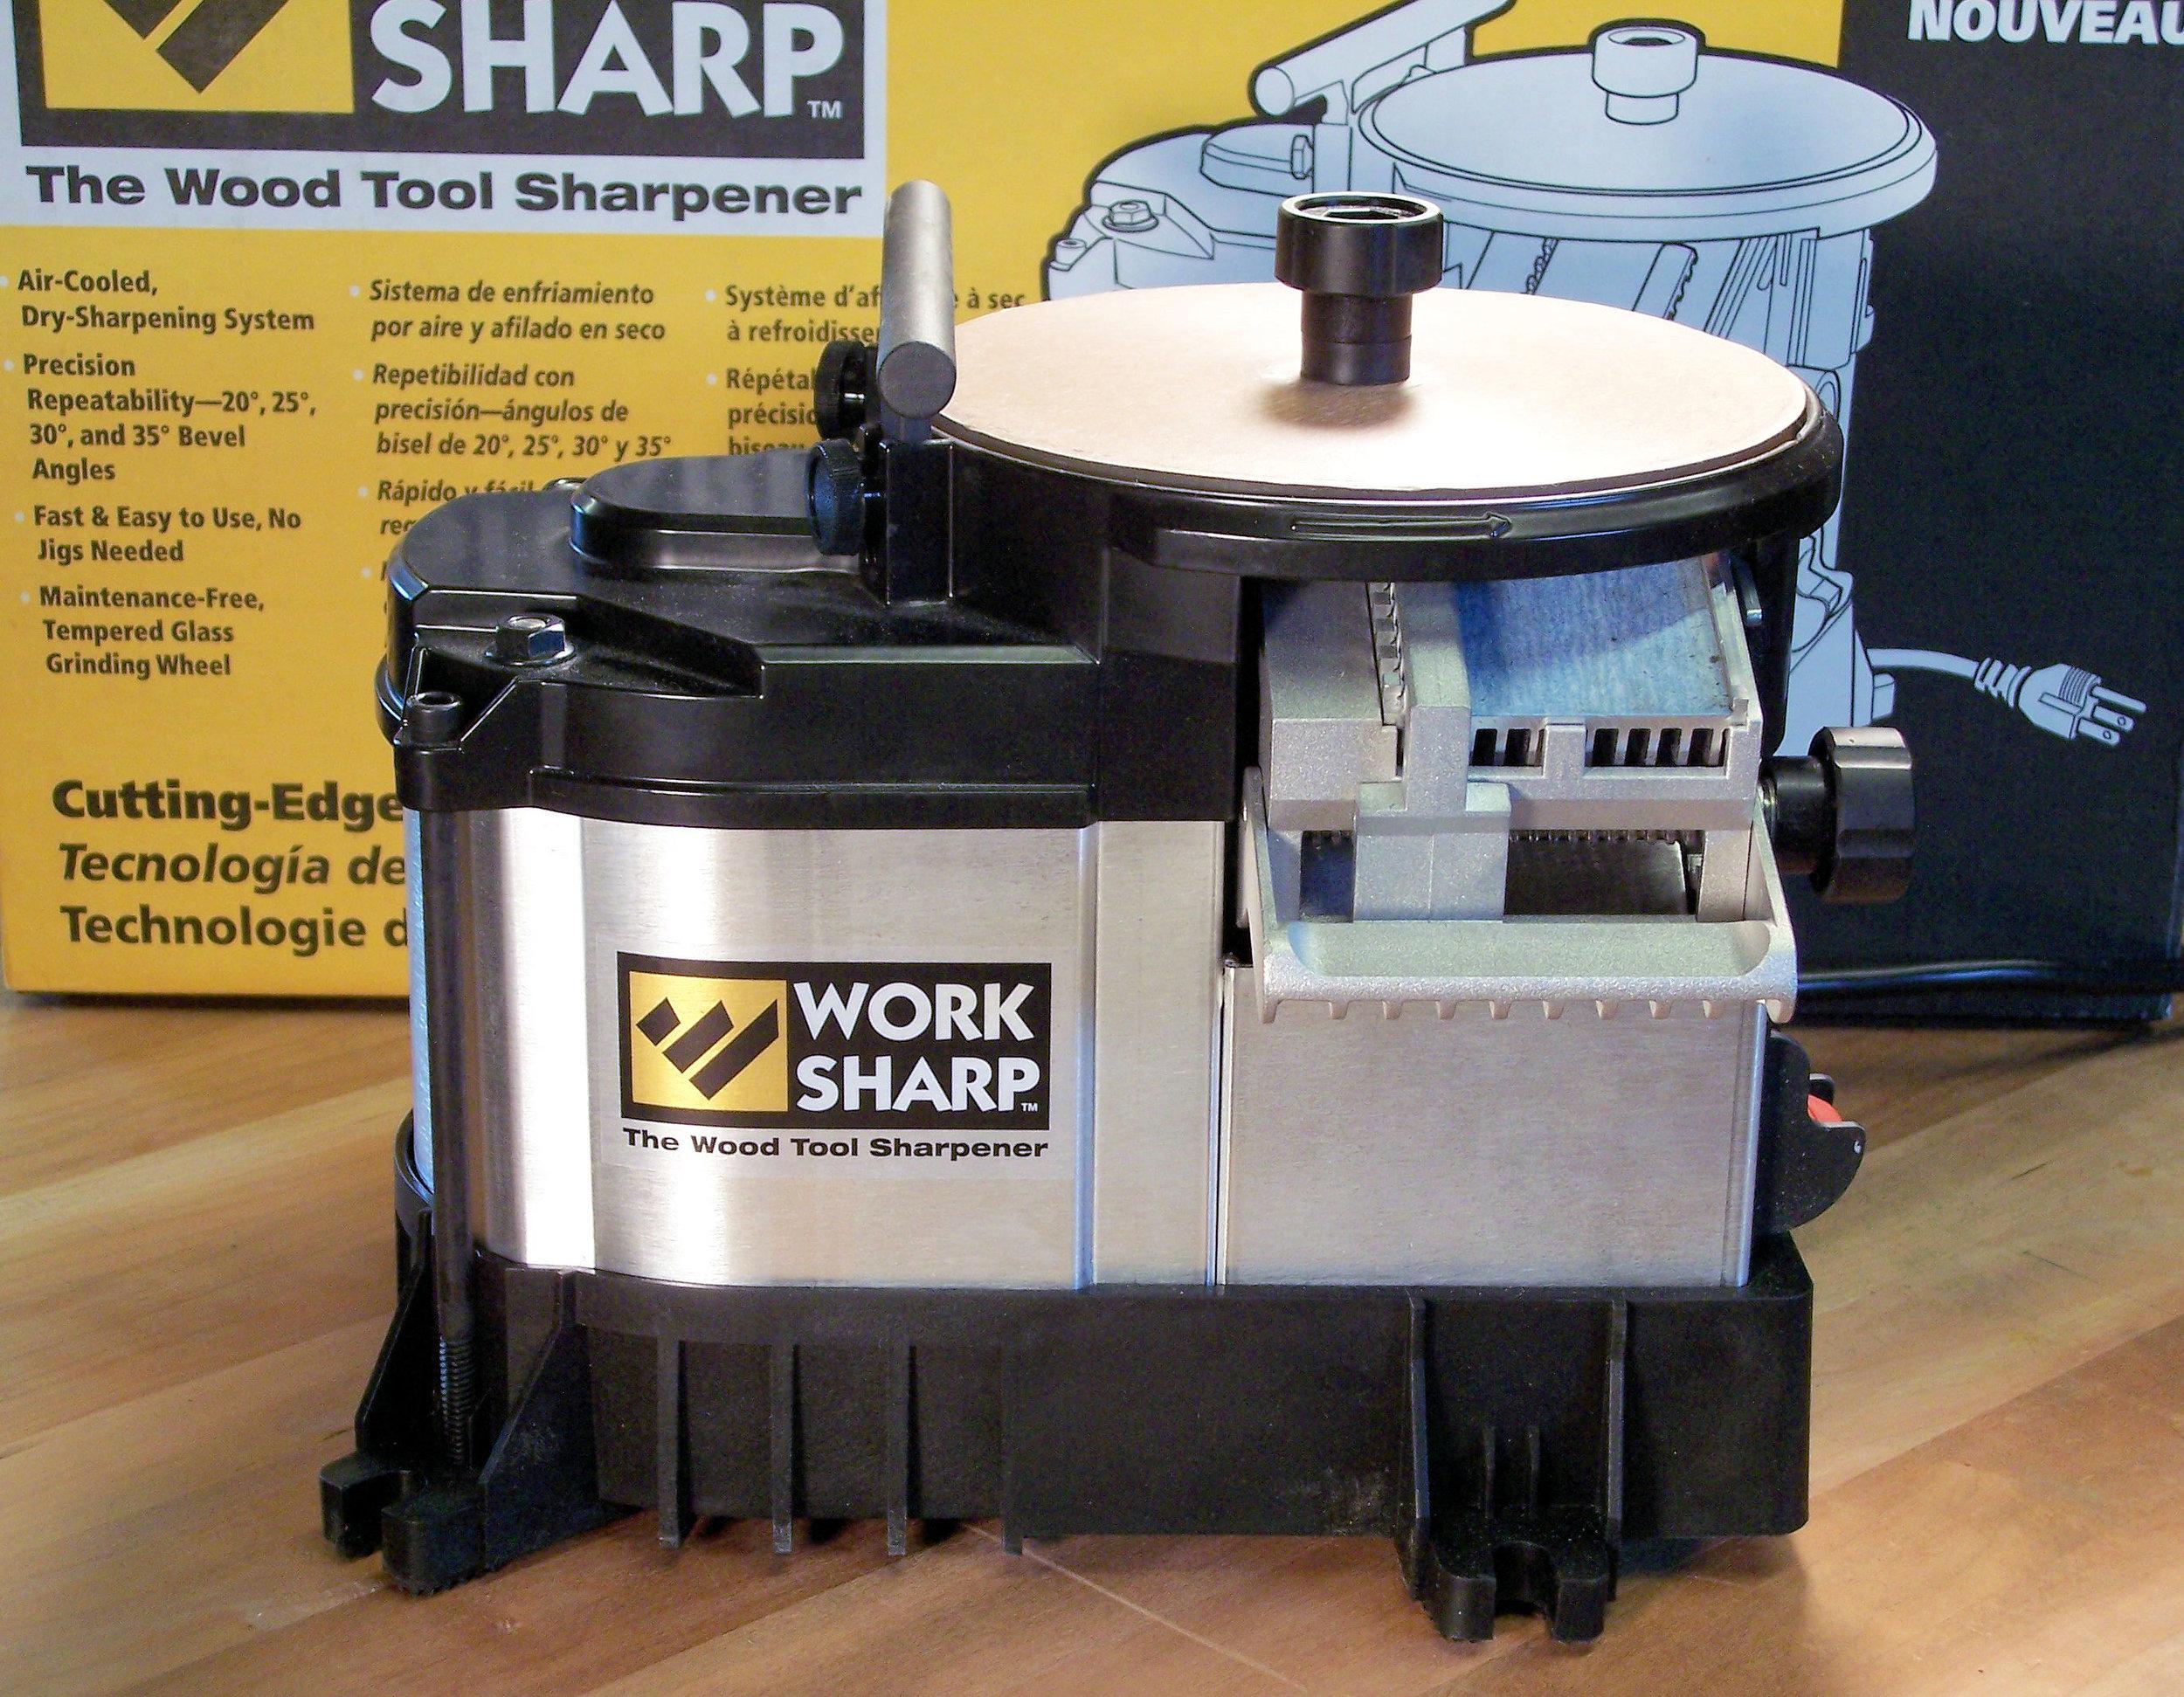 Work Sharp, The Wood Tool Sharpener, Review, Woodcraft Magazine, September 2007